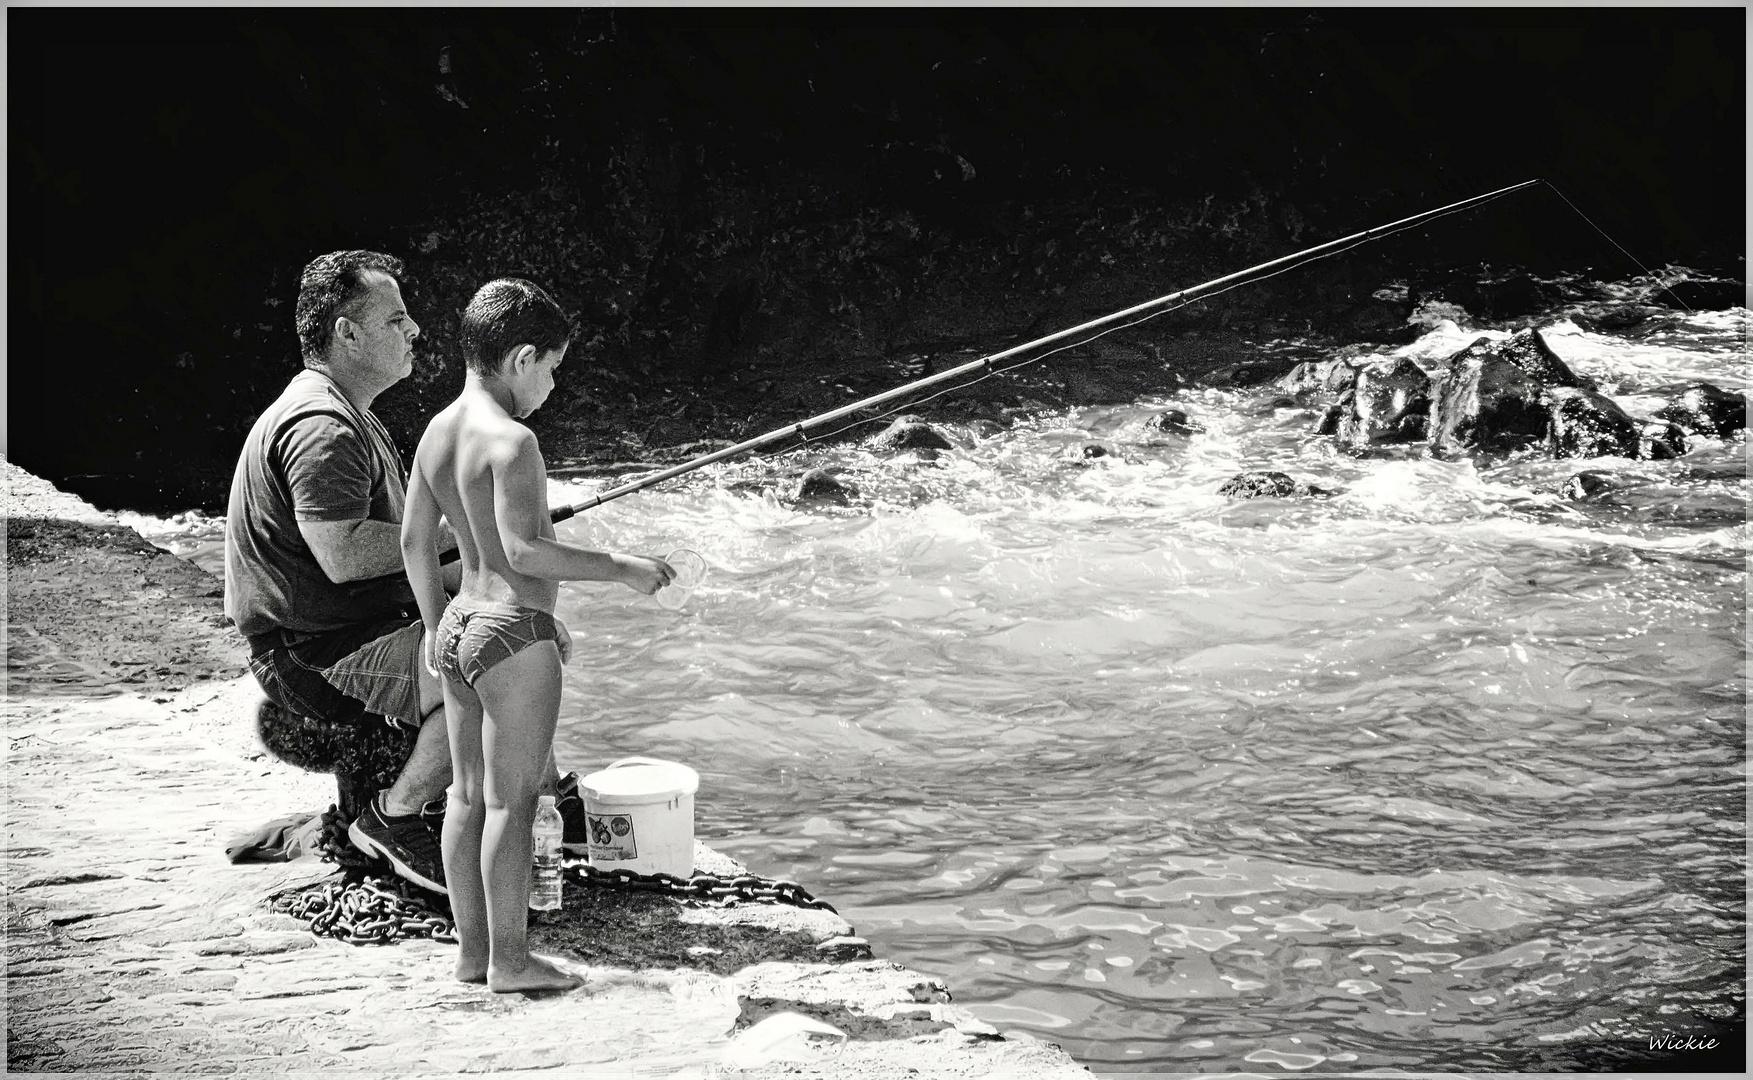 Un pescadito papá.